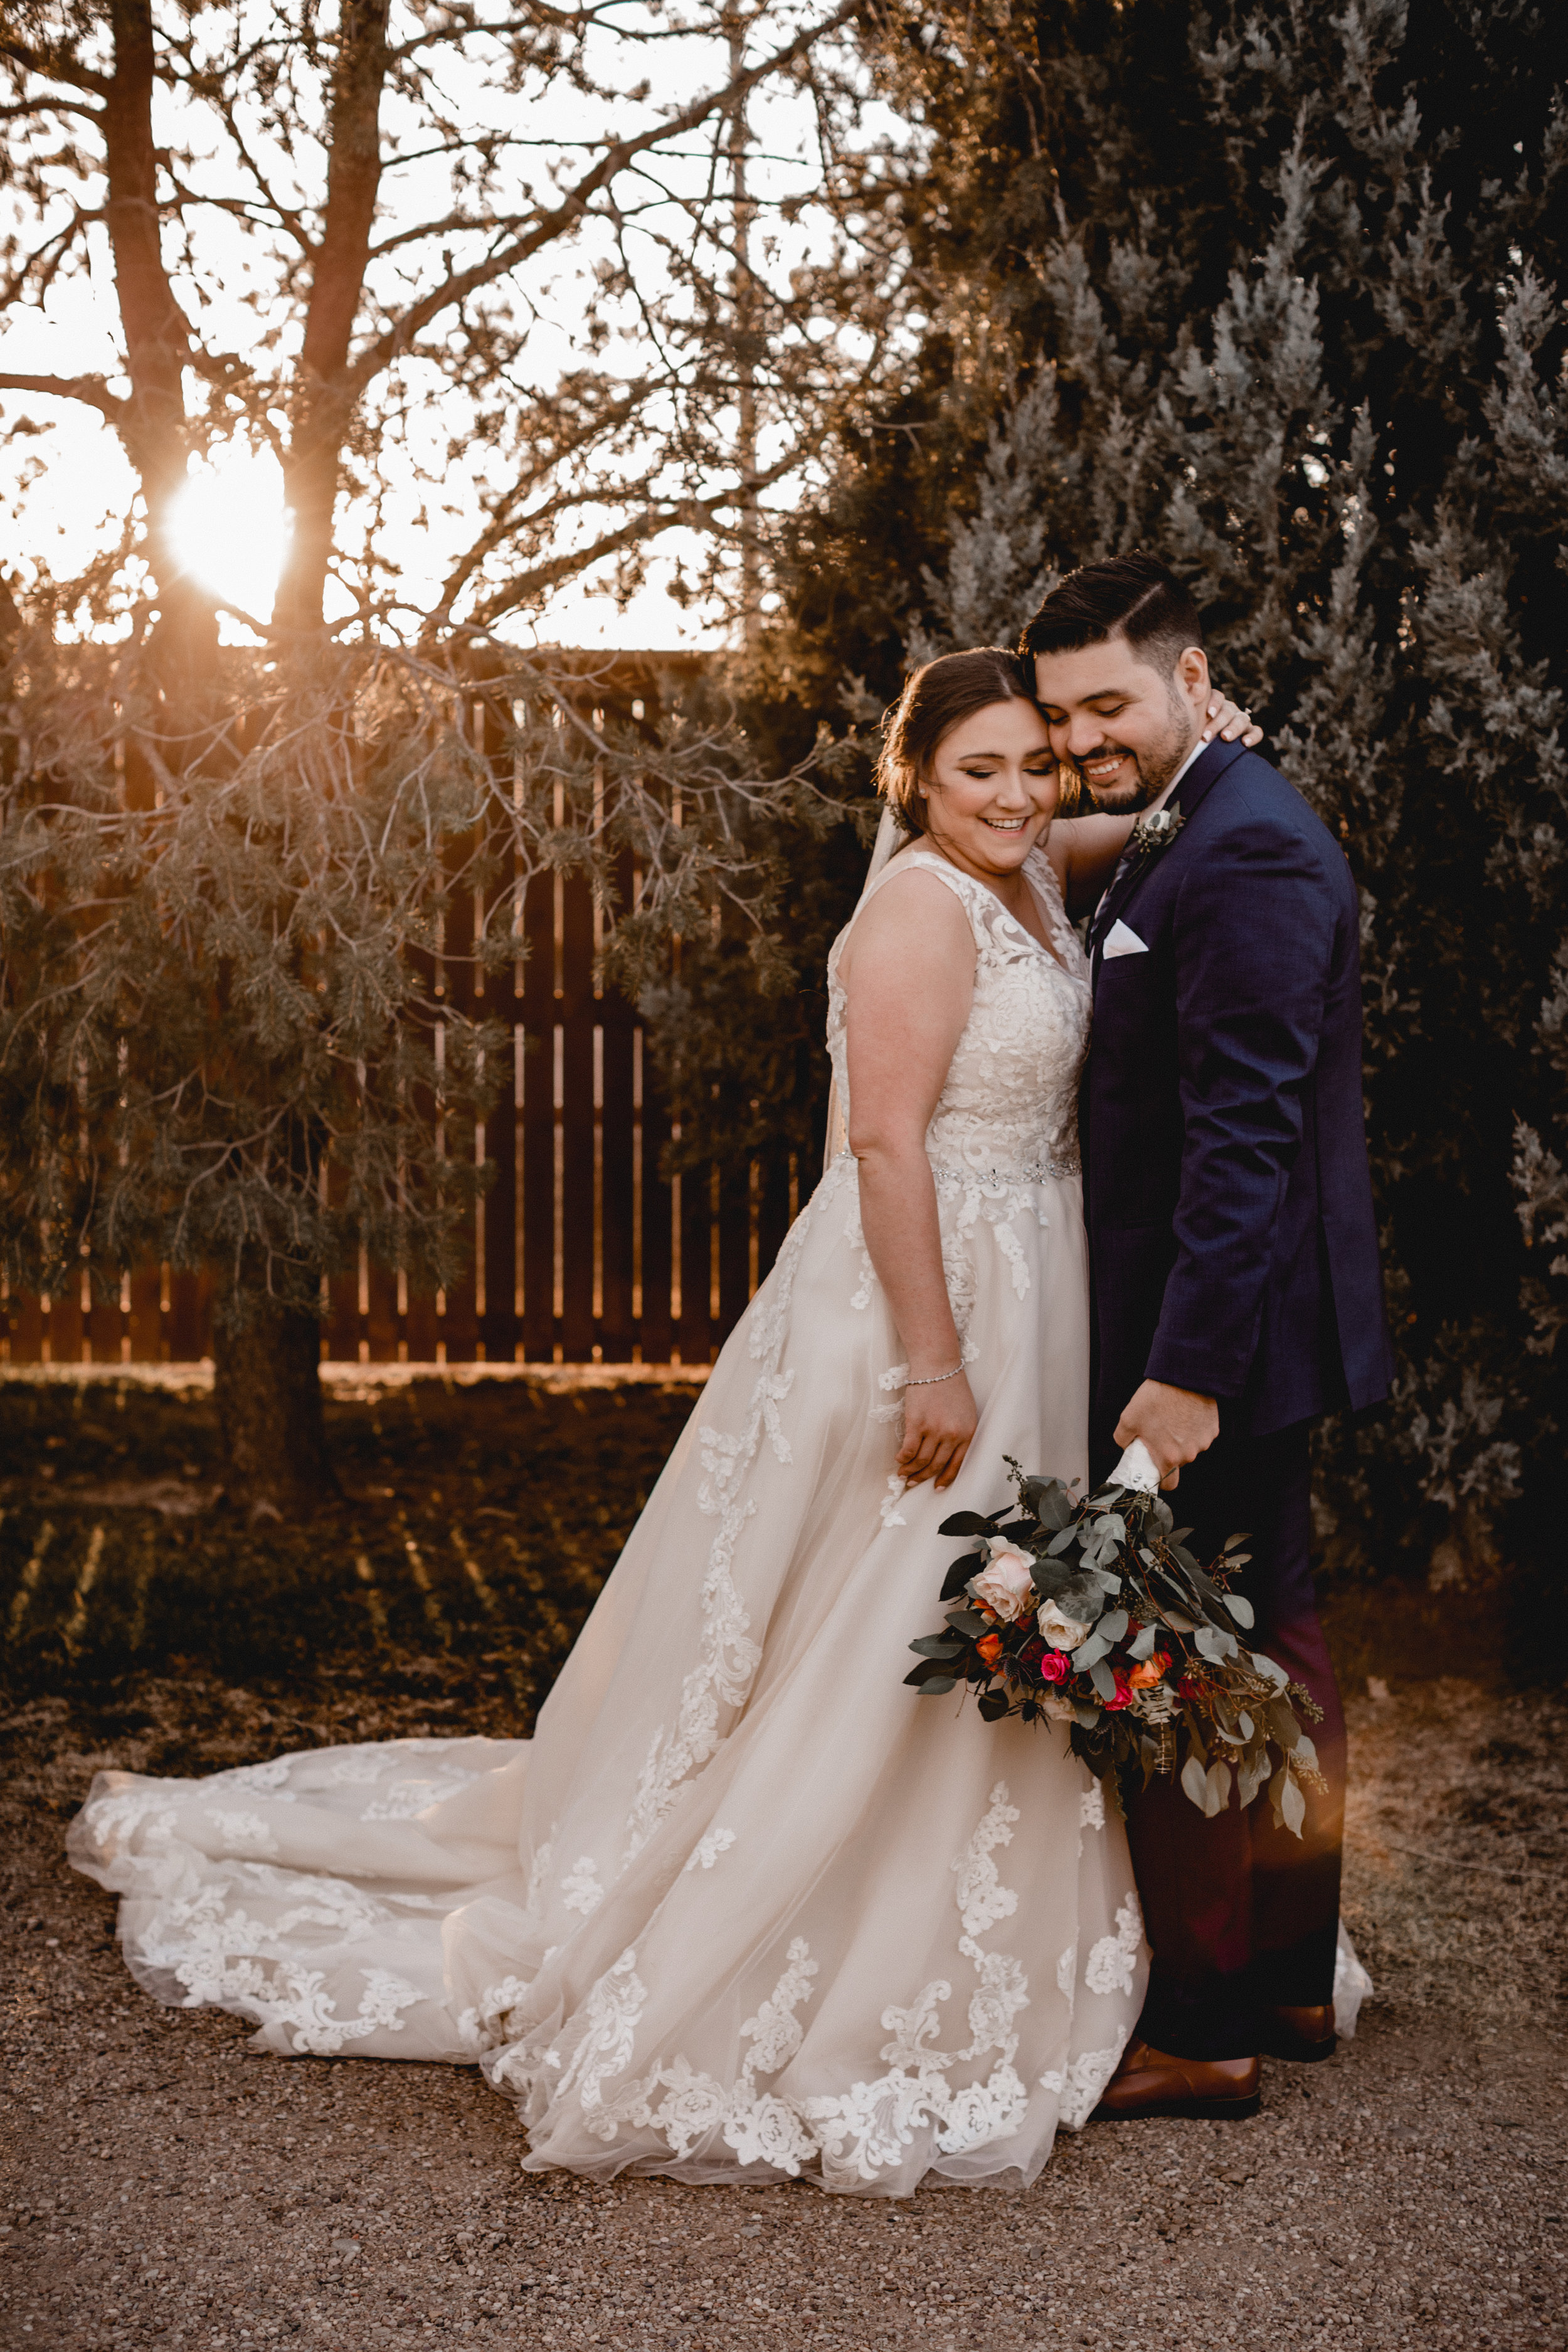 Newlyweds-43.jpg